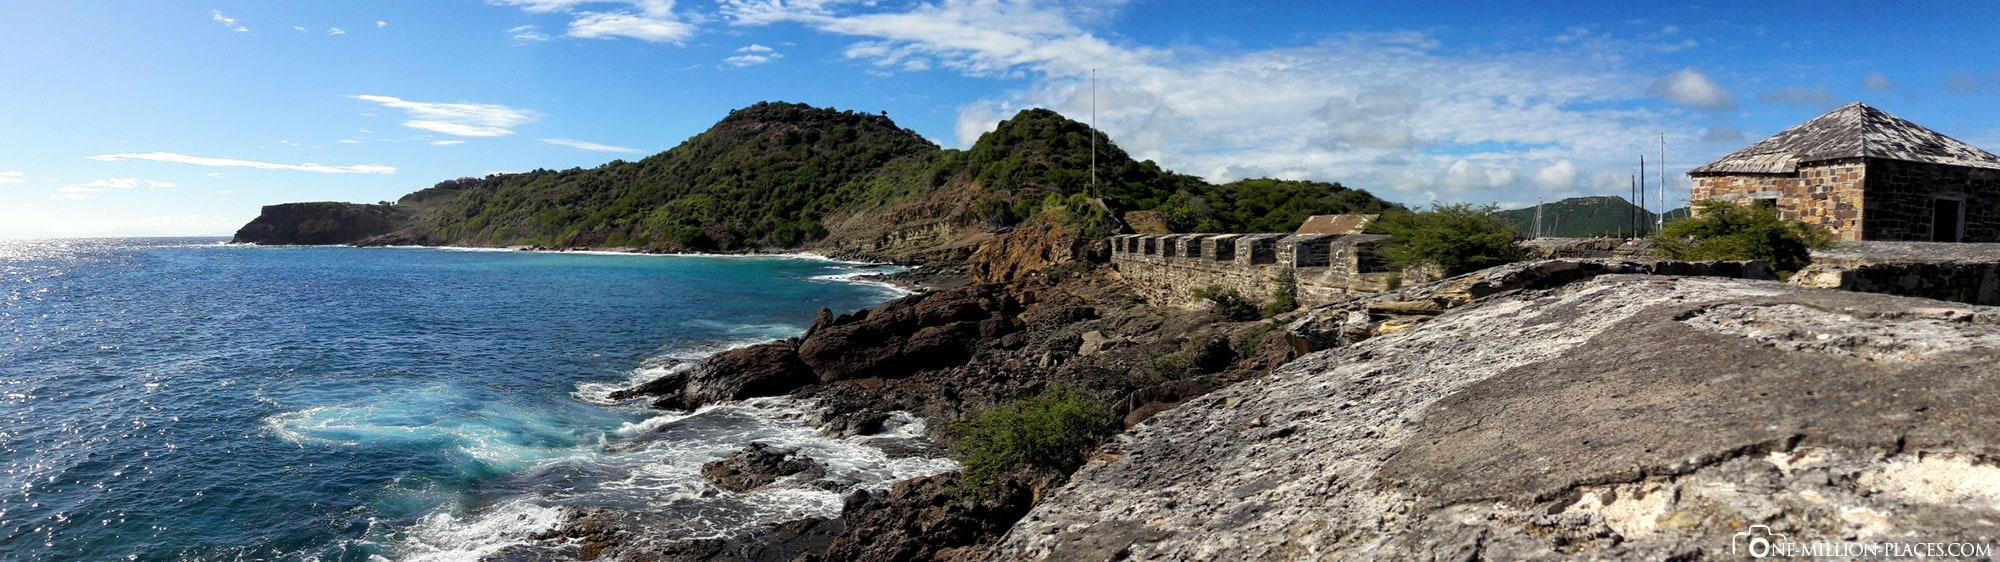 Fort Berkeley, Antigua, St. John's, Caribbean, World Heritage, Attractions, On Your Own, Travelreport